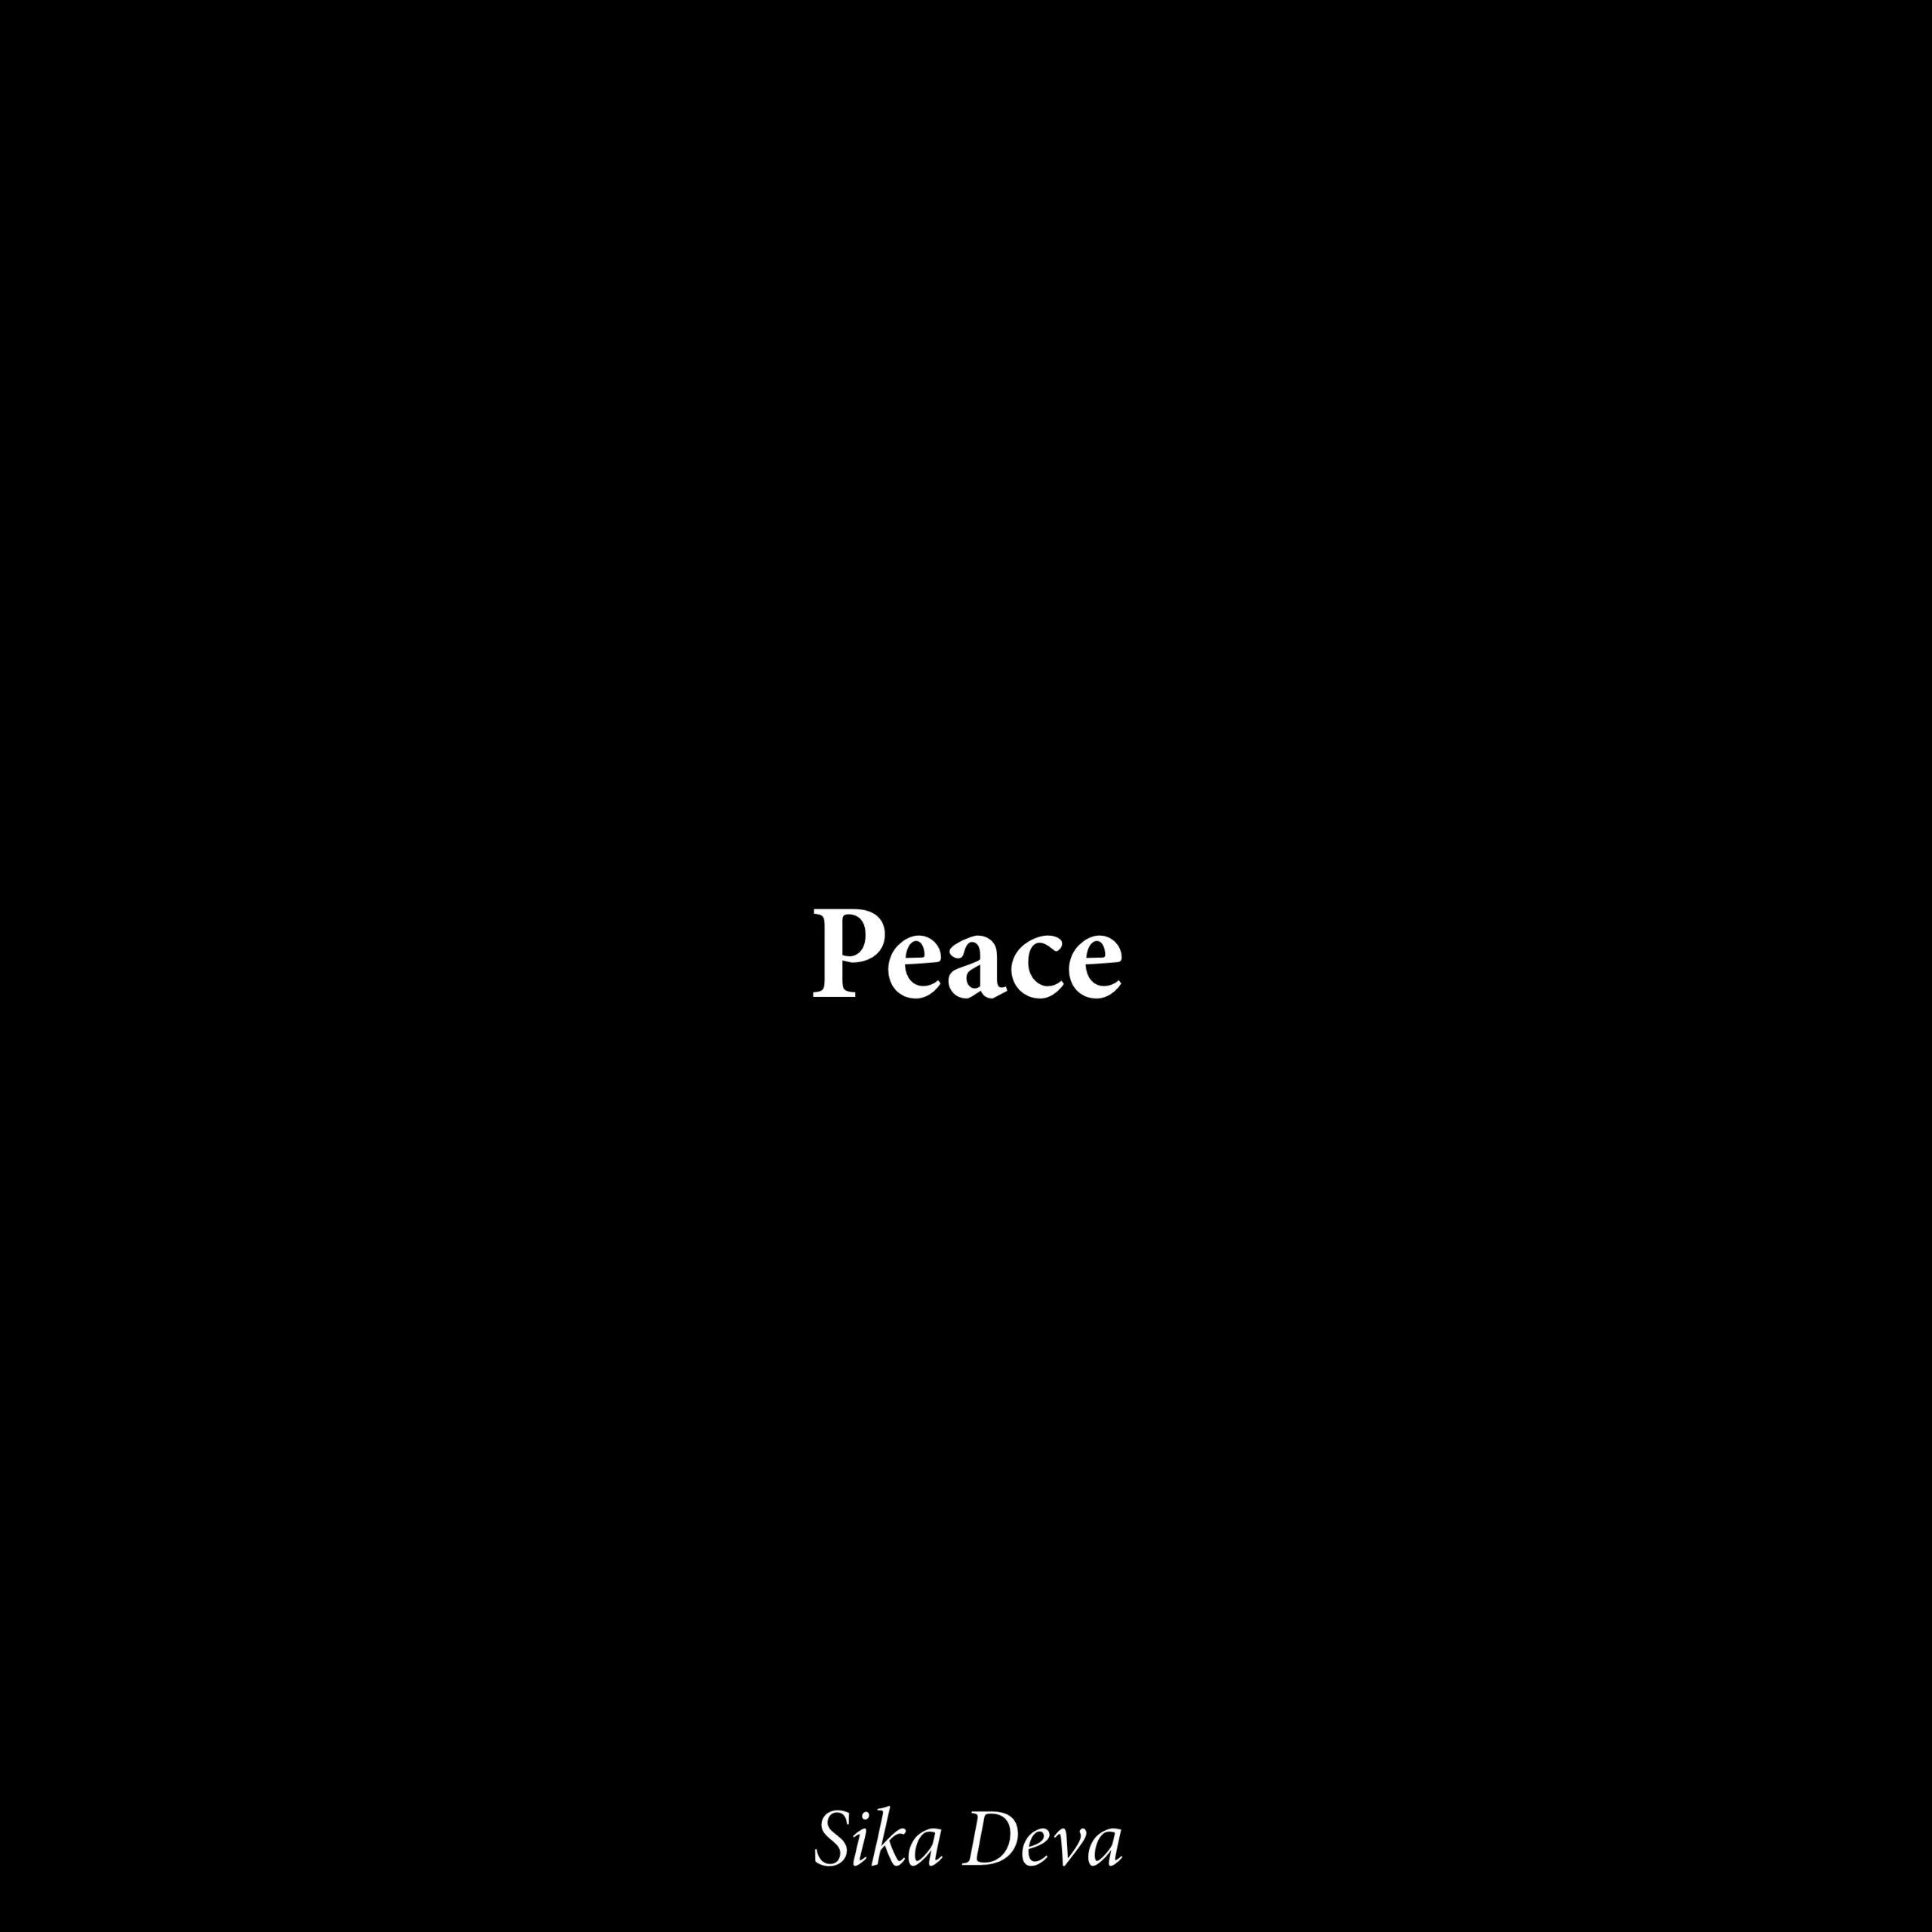 Pochette-peace-sikadeva